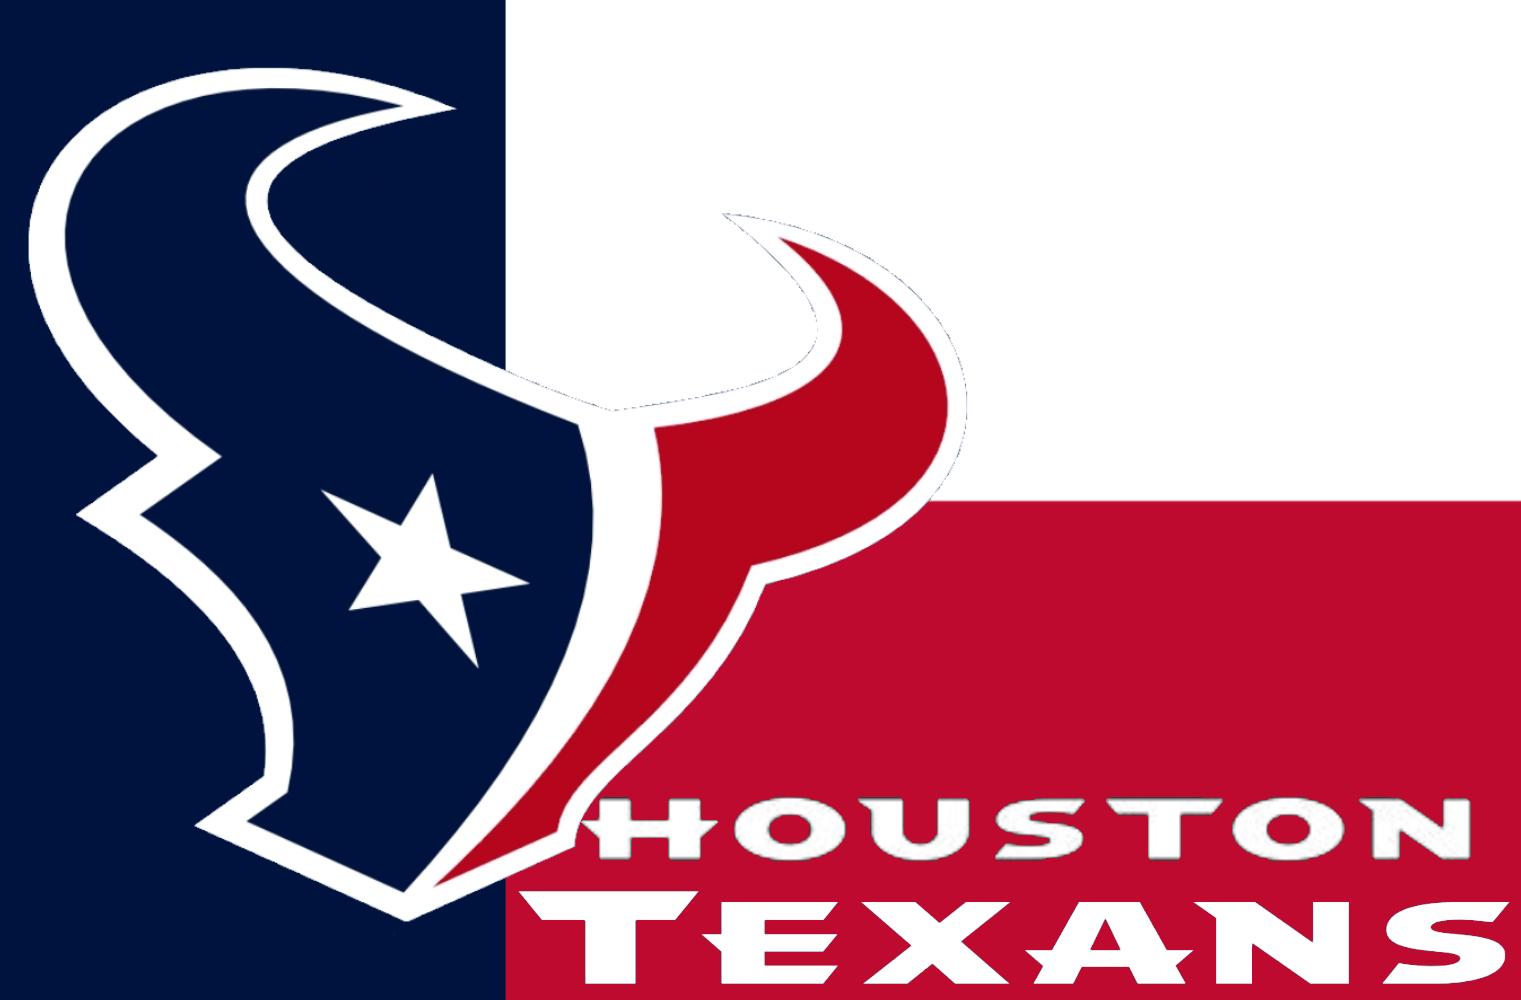 High Resolution Wallpaper   Houston Texans 1521x1000 px